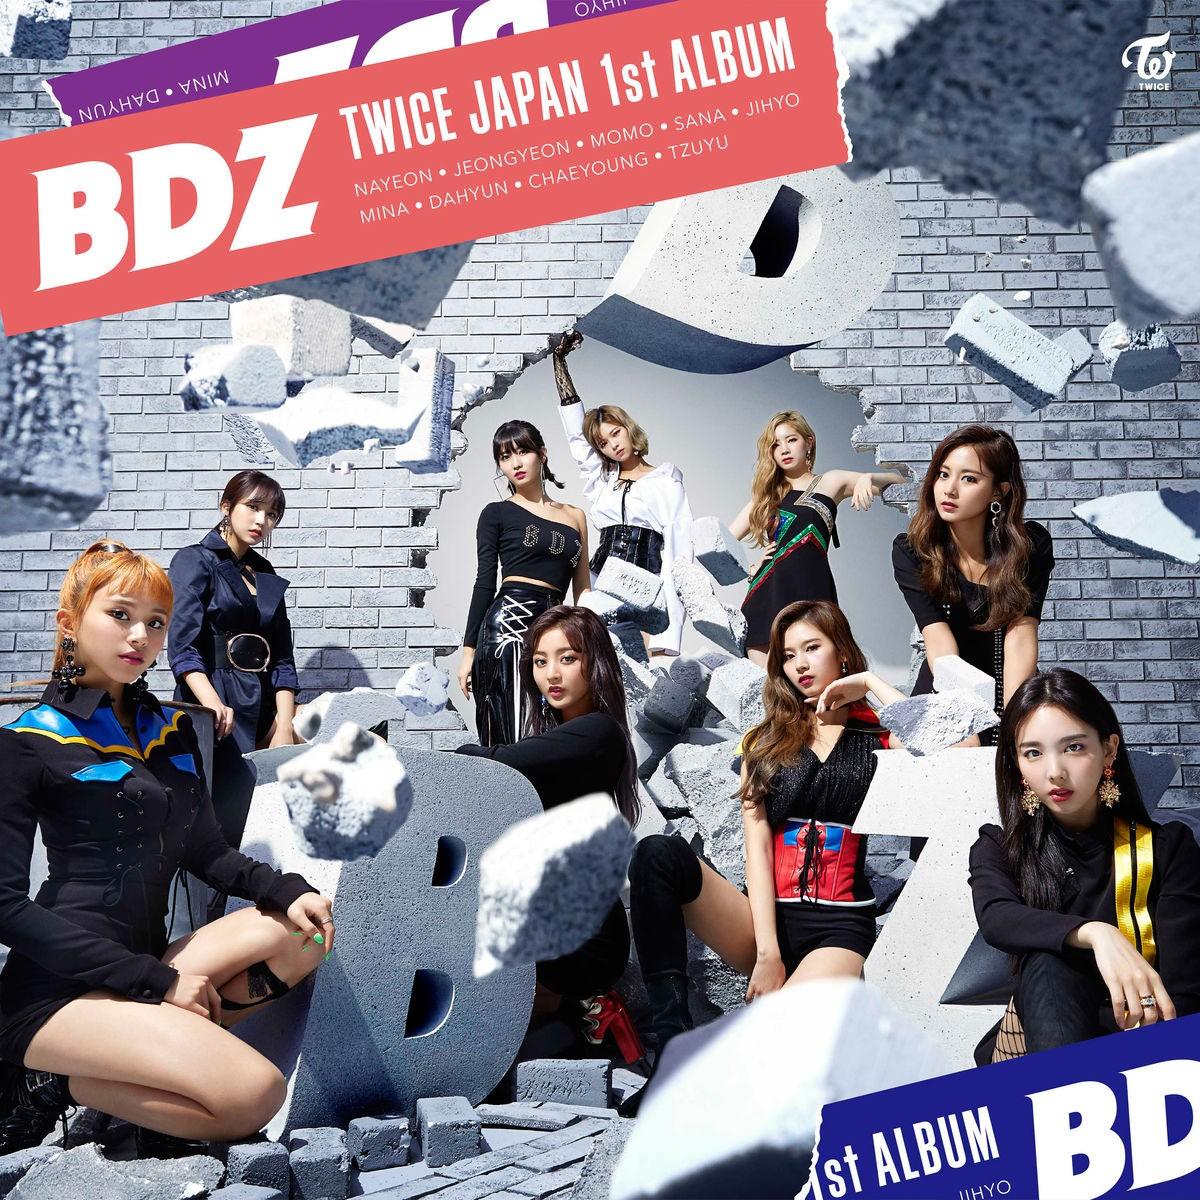 TWICE (트와이스) – BDZ [FLAC + MP3 320 / WEB] [2018 08 17] – J-pop